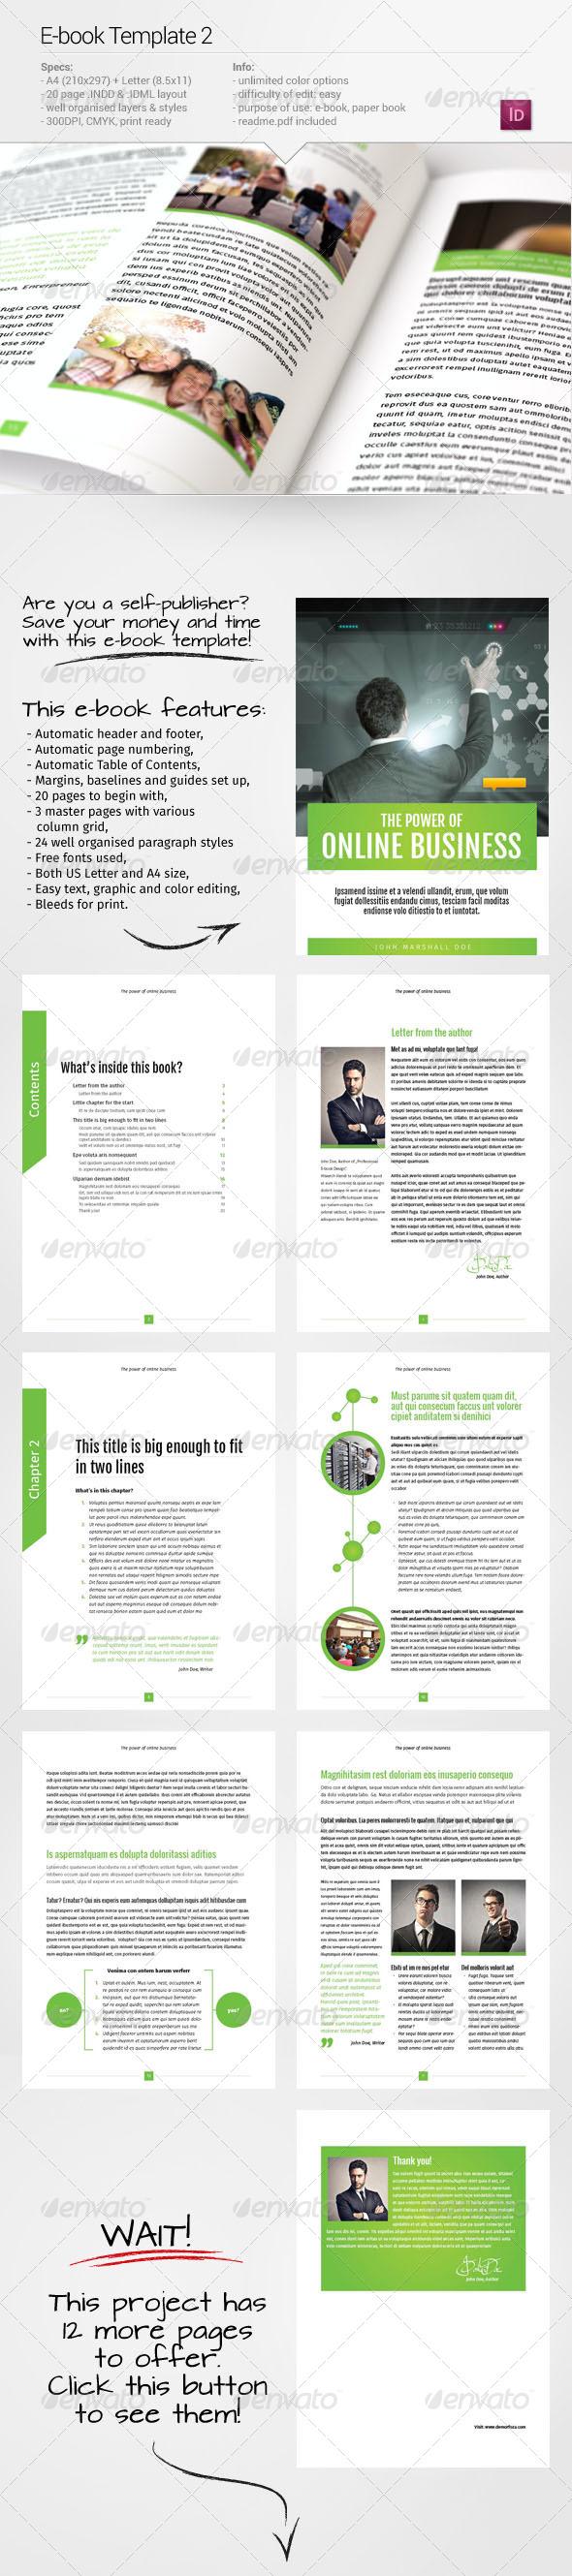 E-book Template 2 - Digital Books ePublishing